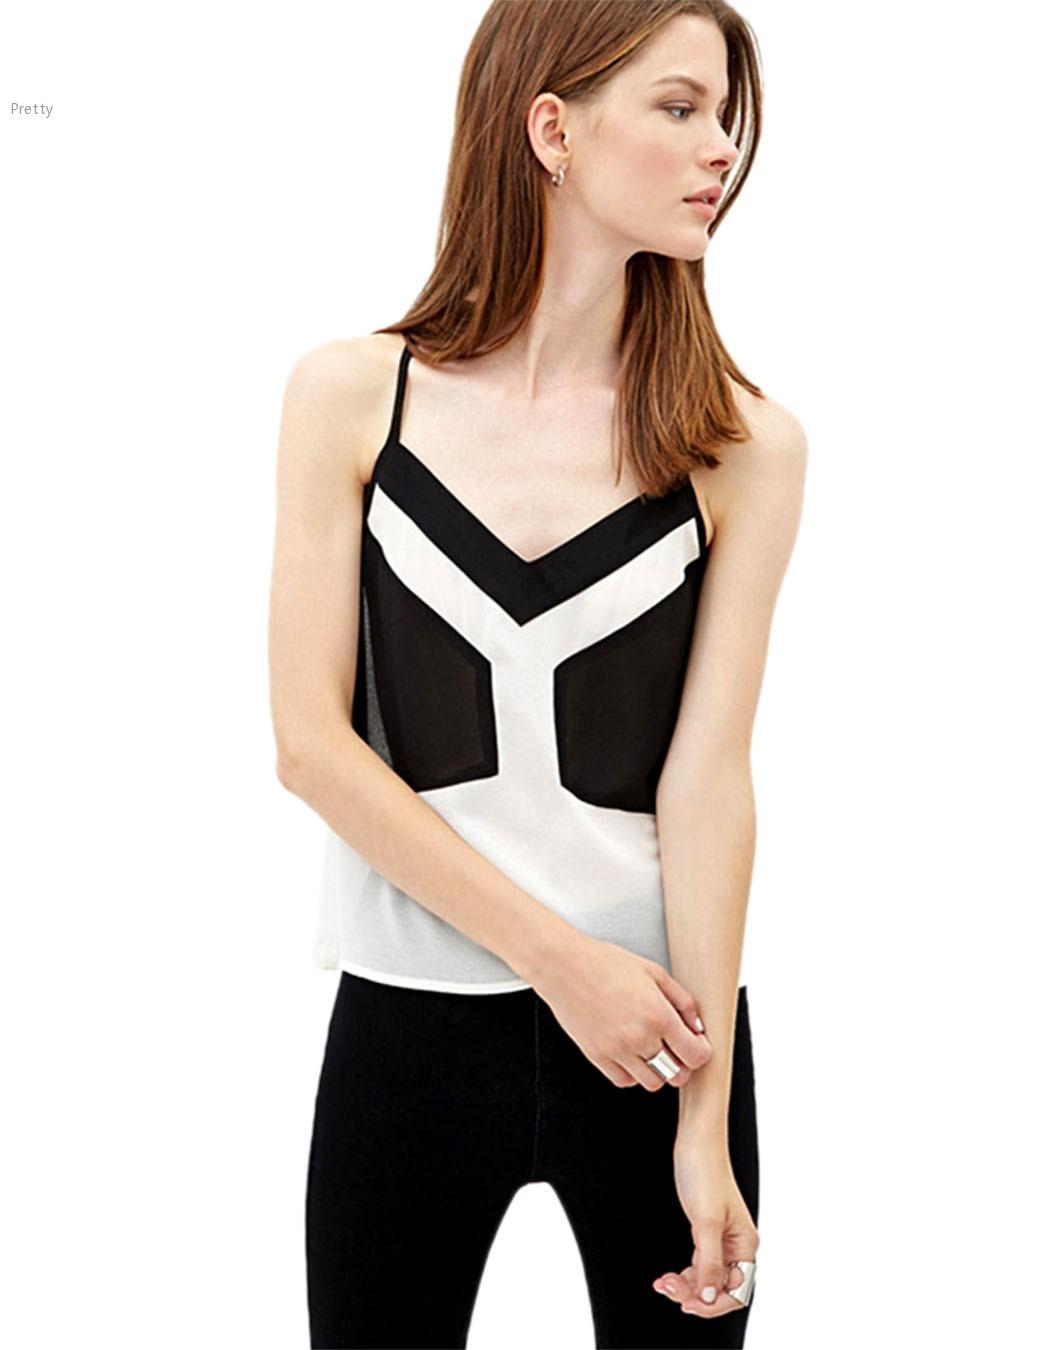 61b0fa7205c25f Get Quotations · 2015 Stylish Lady Women Sleeveless Vest Chiffon Vest Tank  Tops Plus Size Patchwork Backless Strap Tank